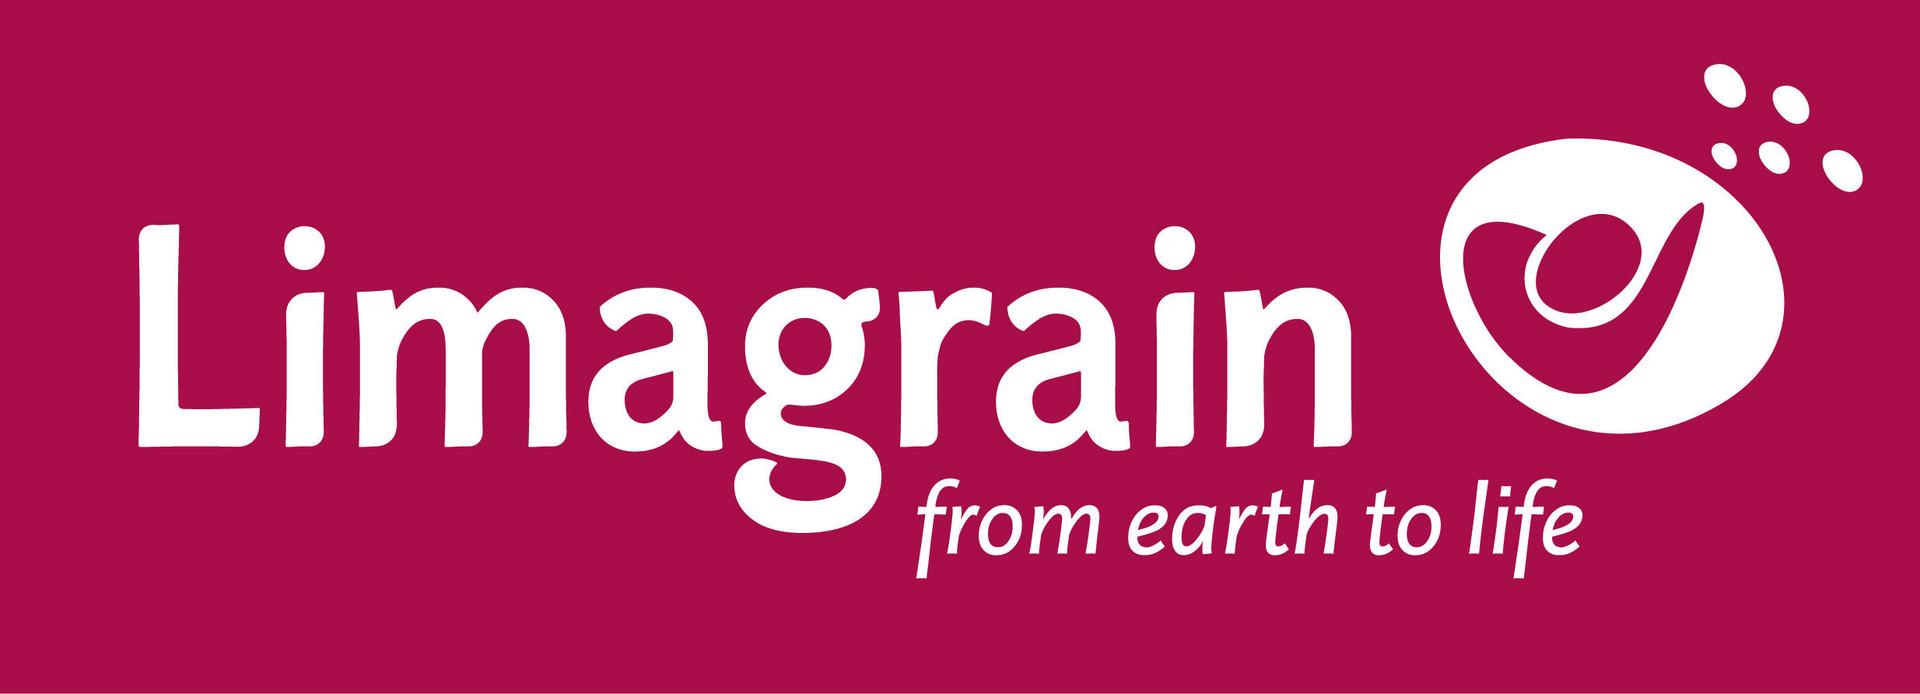 logo-Groupe-Limagrain-EN.jpg